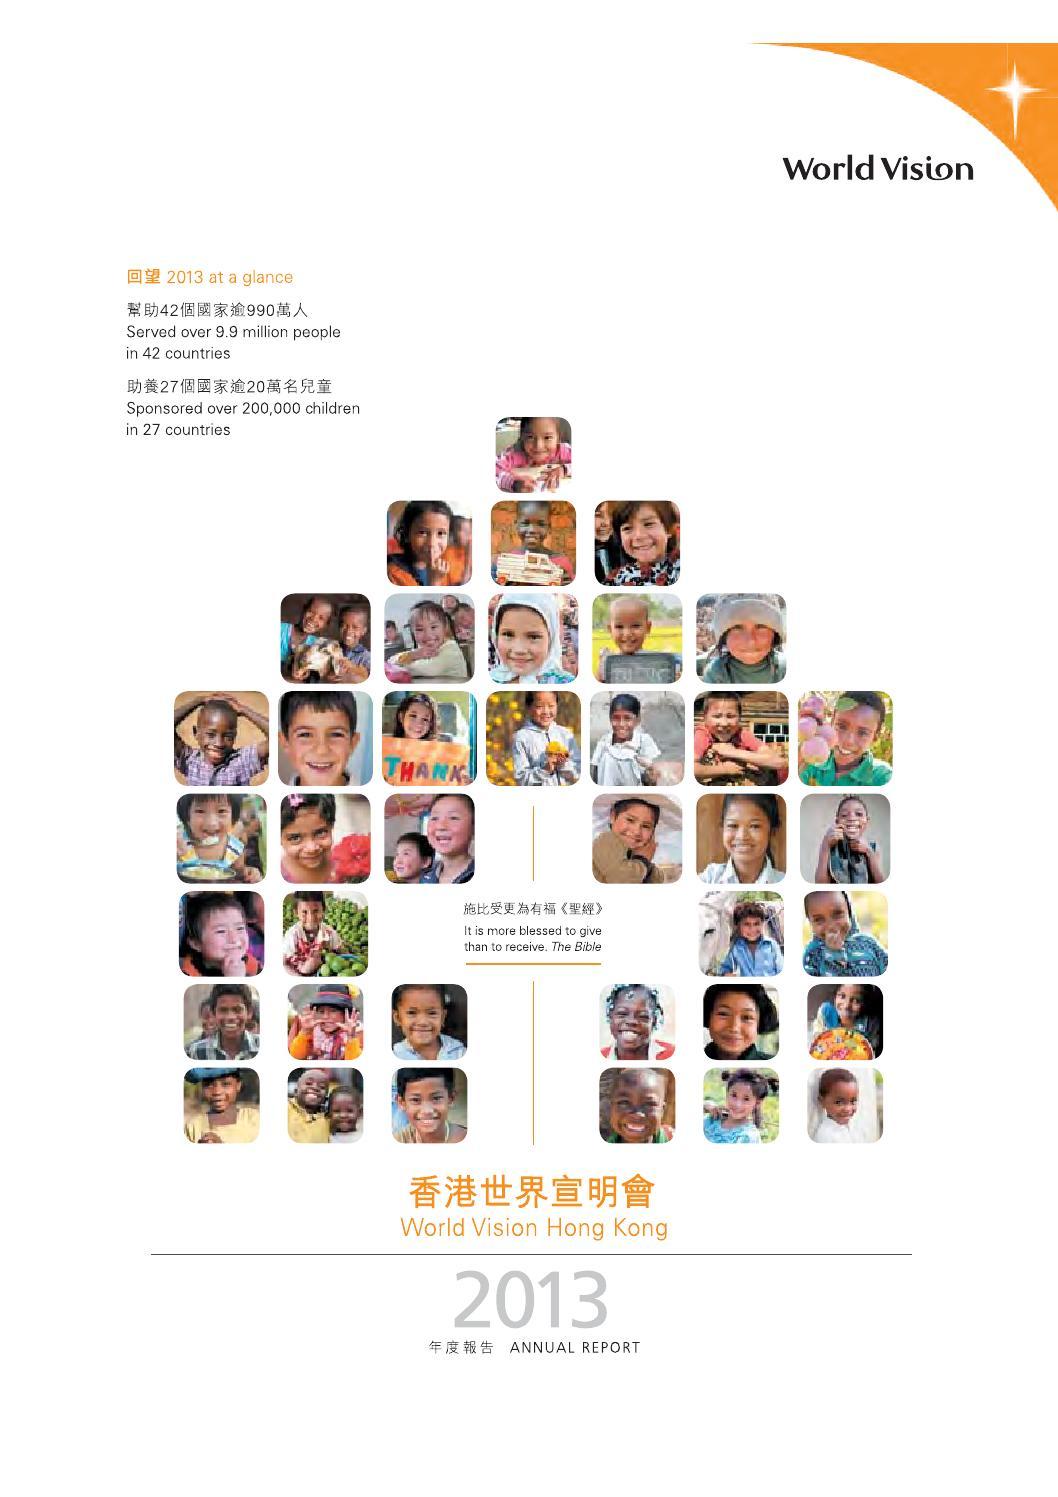 Annual Report 2013 by 香港世界宣明會 World Vision Hong Kong - Issuu